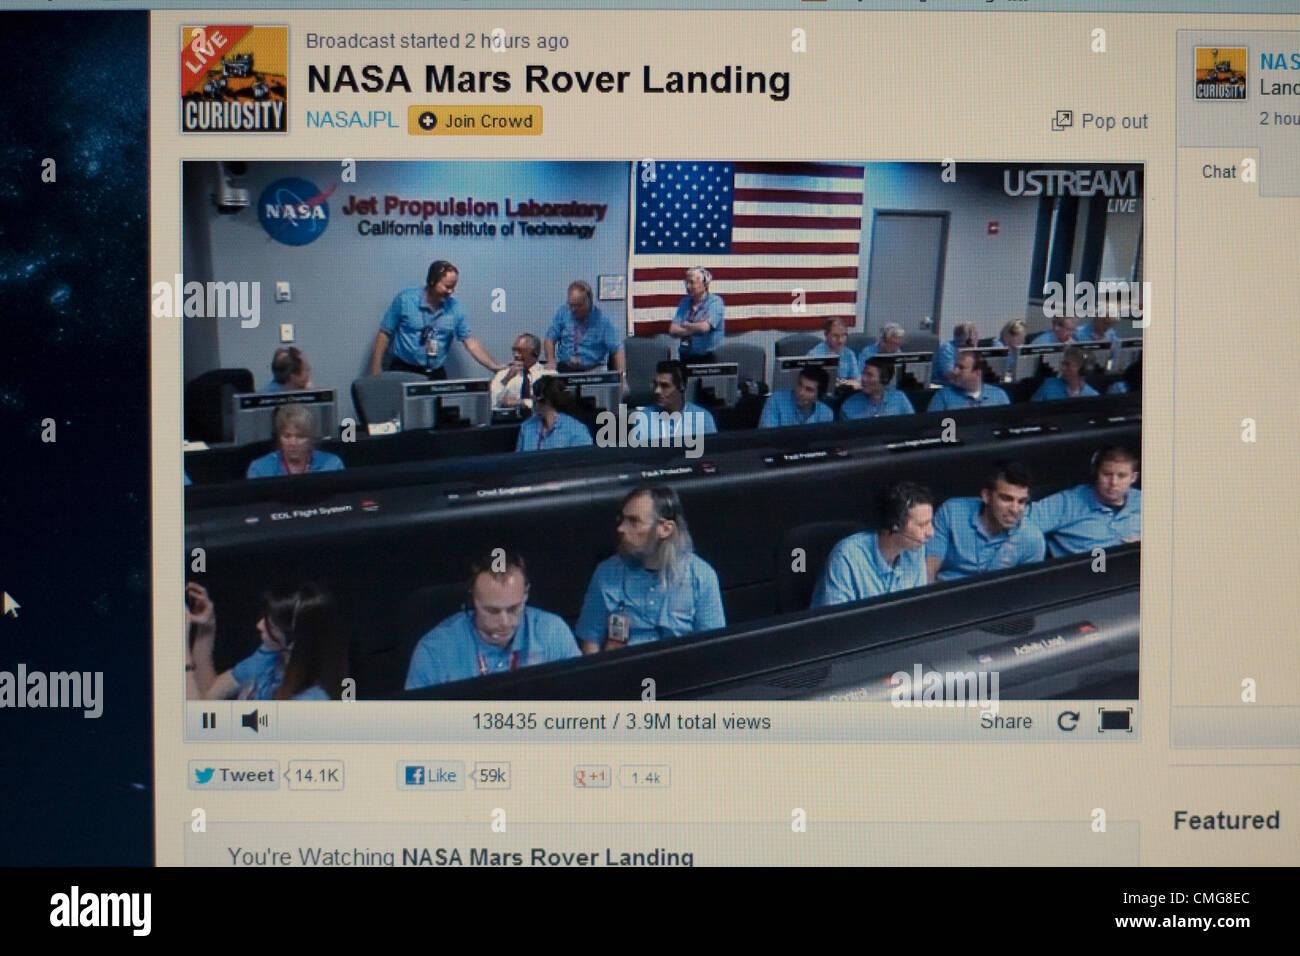 nasa live stream of mars landing - photo #34